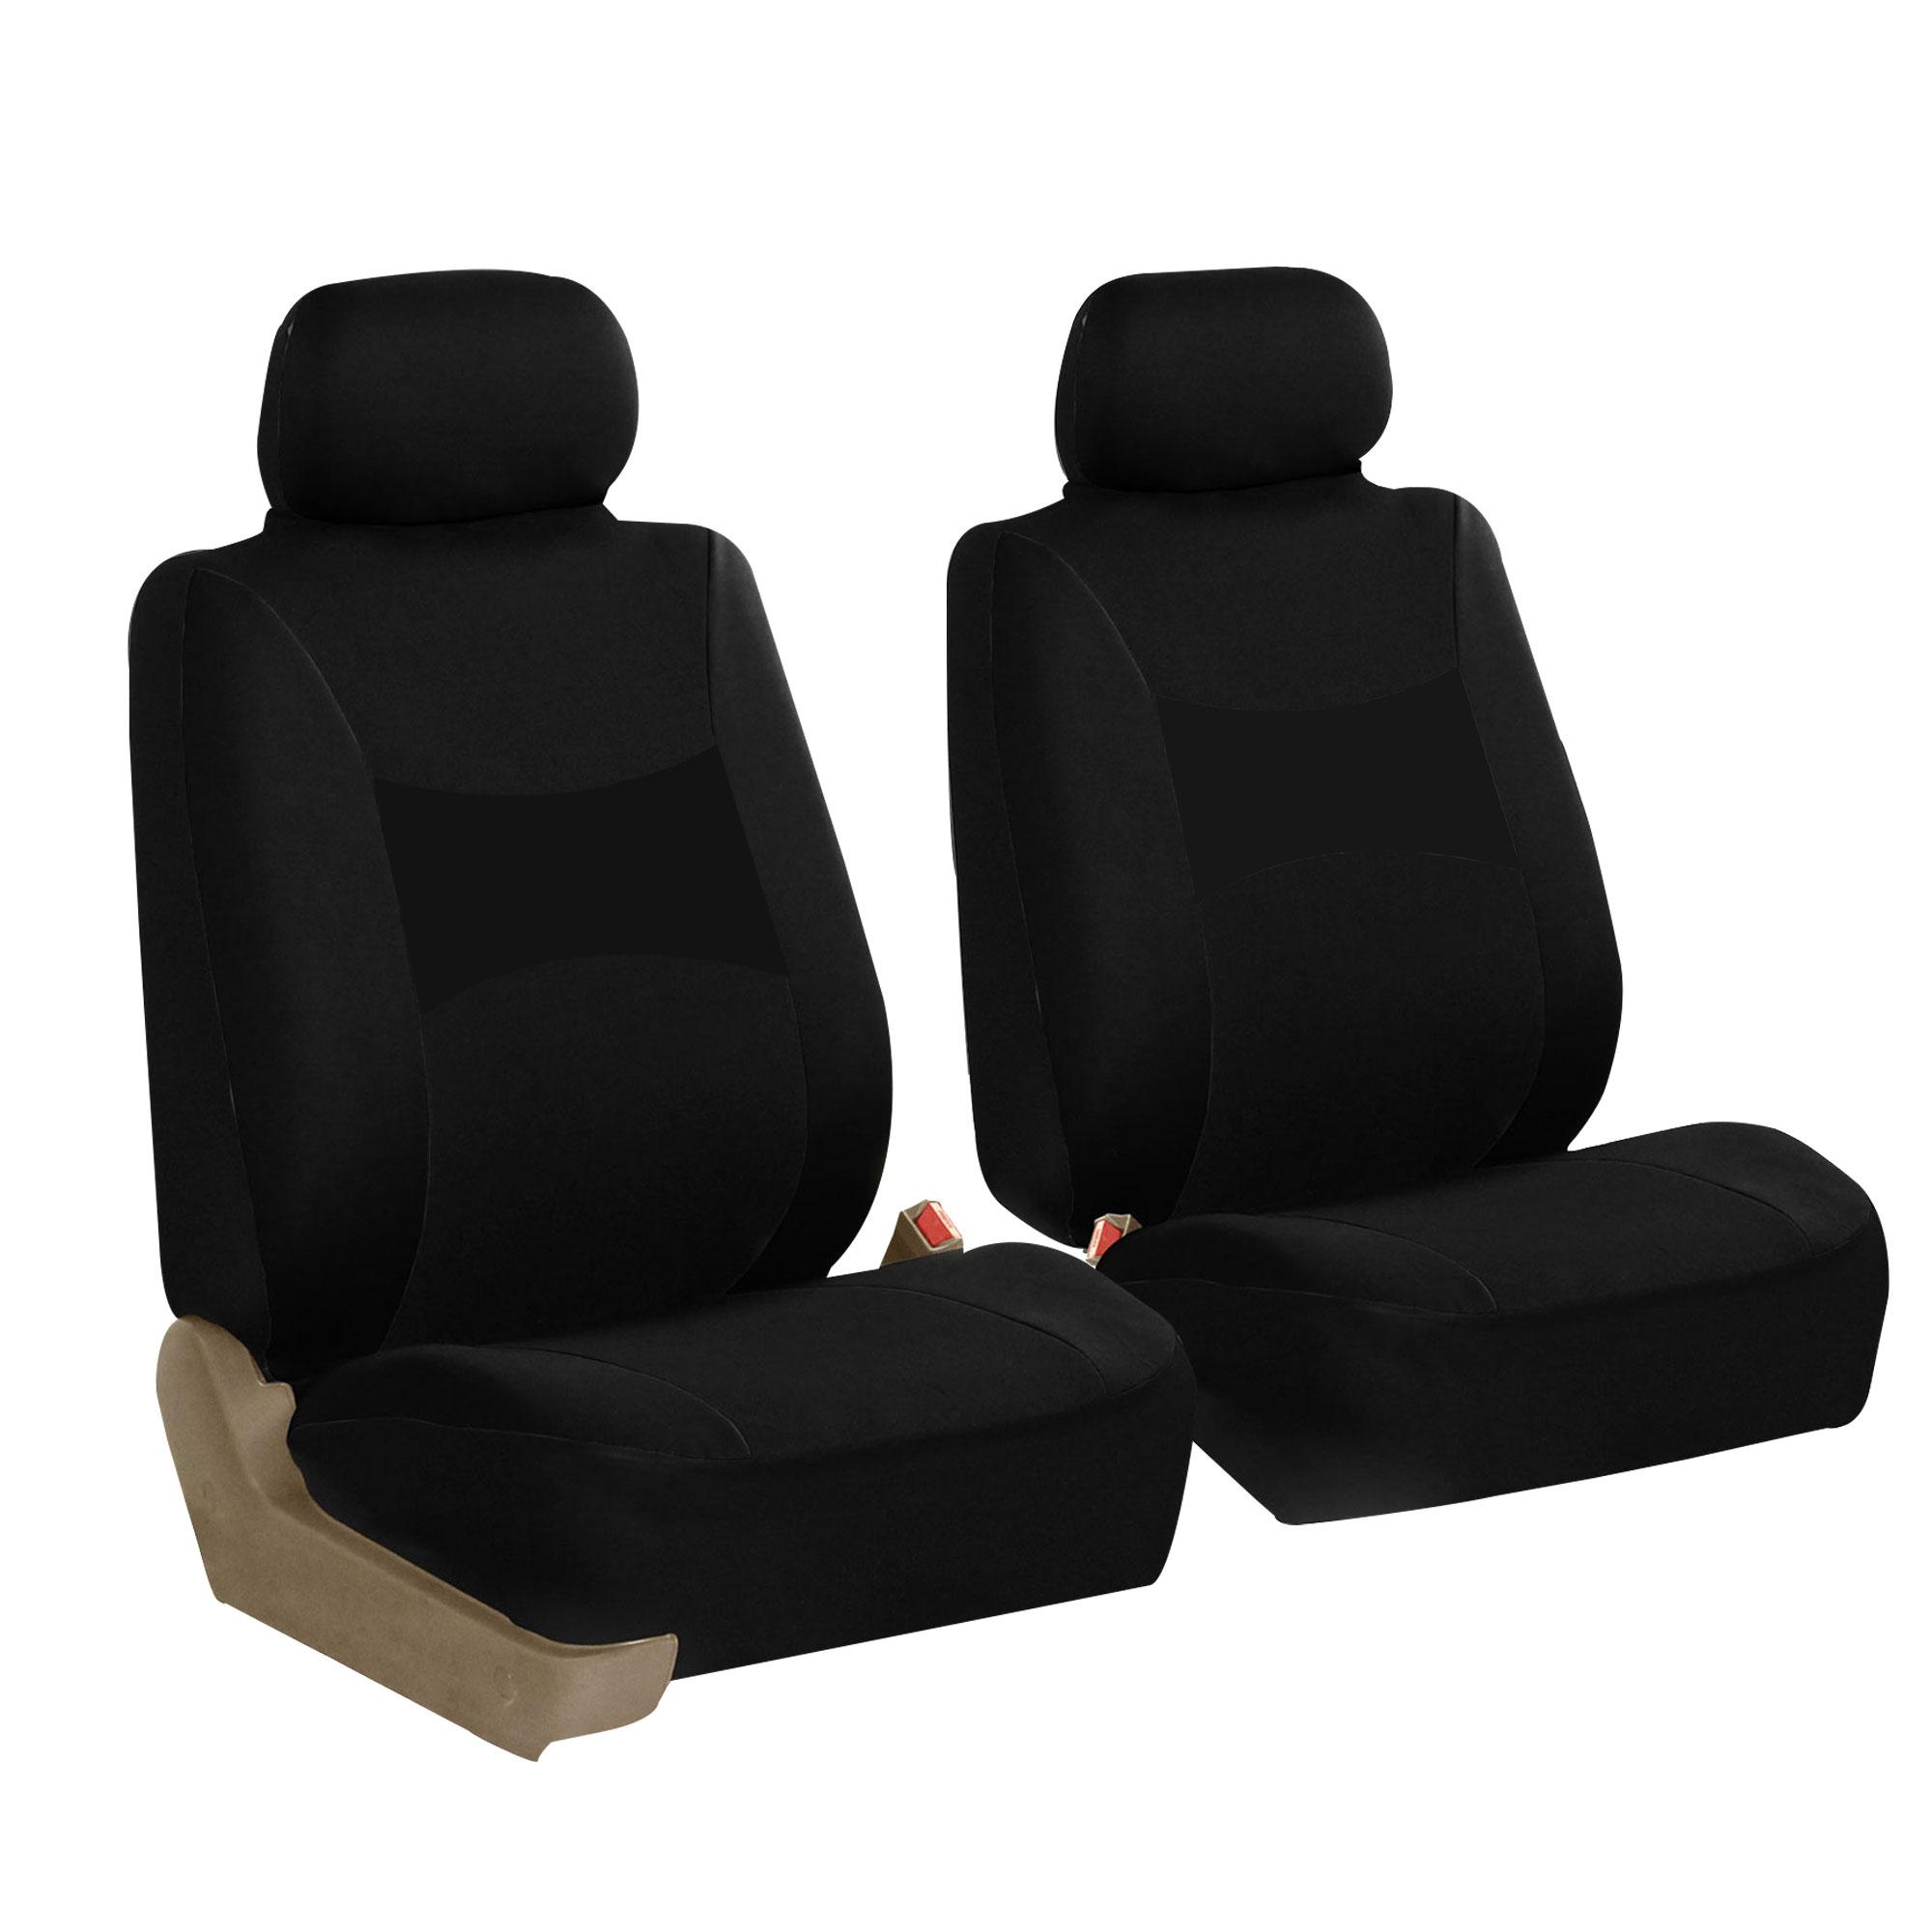 FB030black102_v2 seat covers